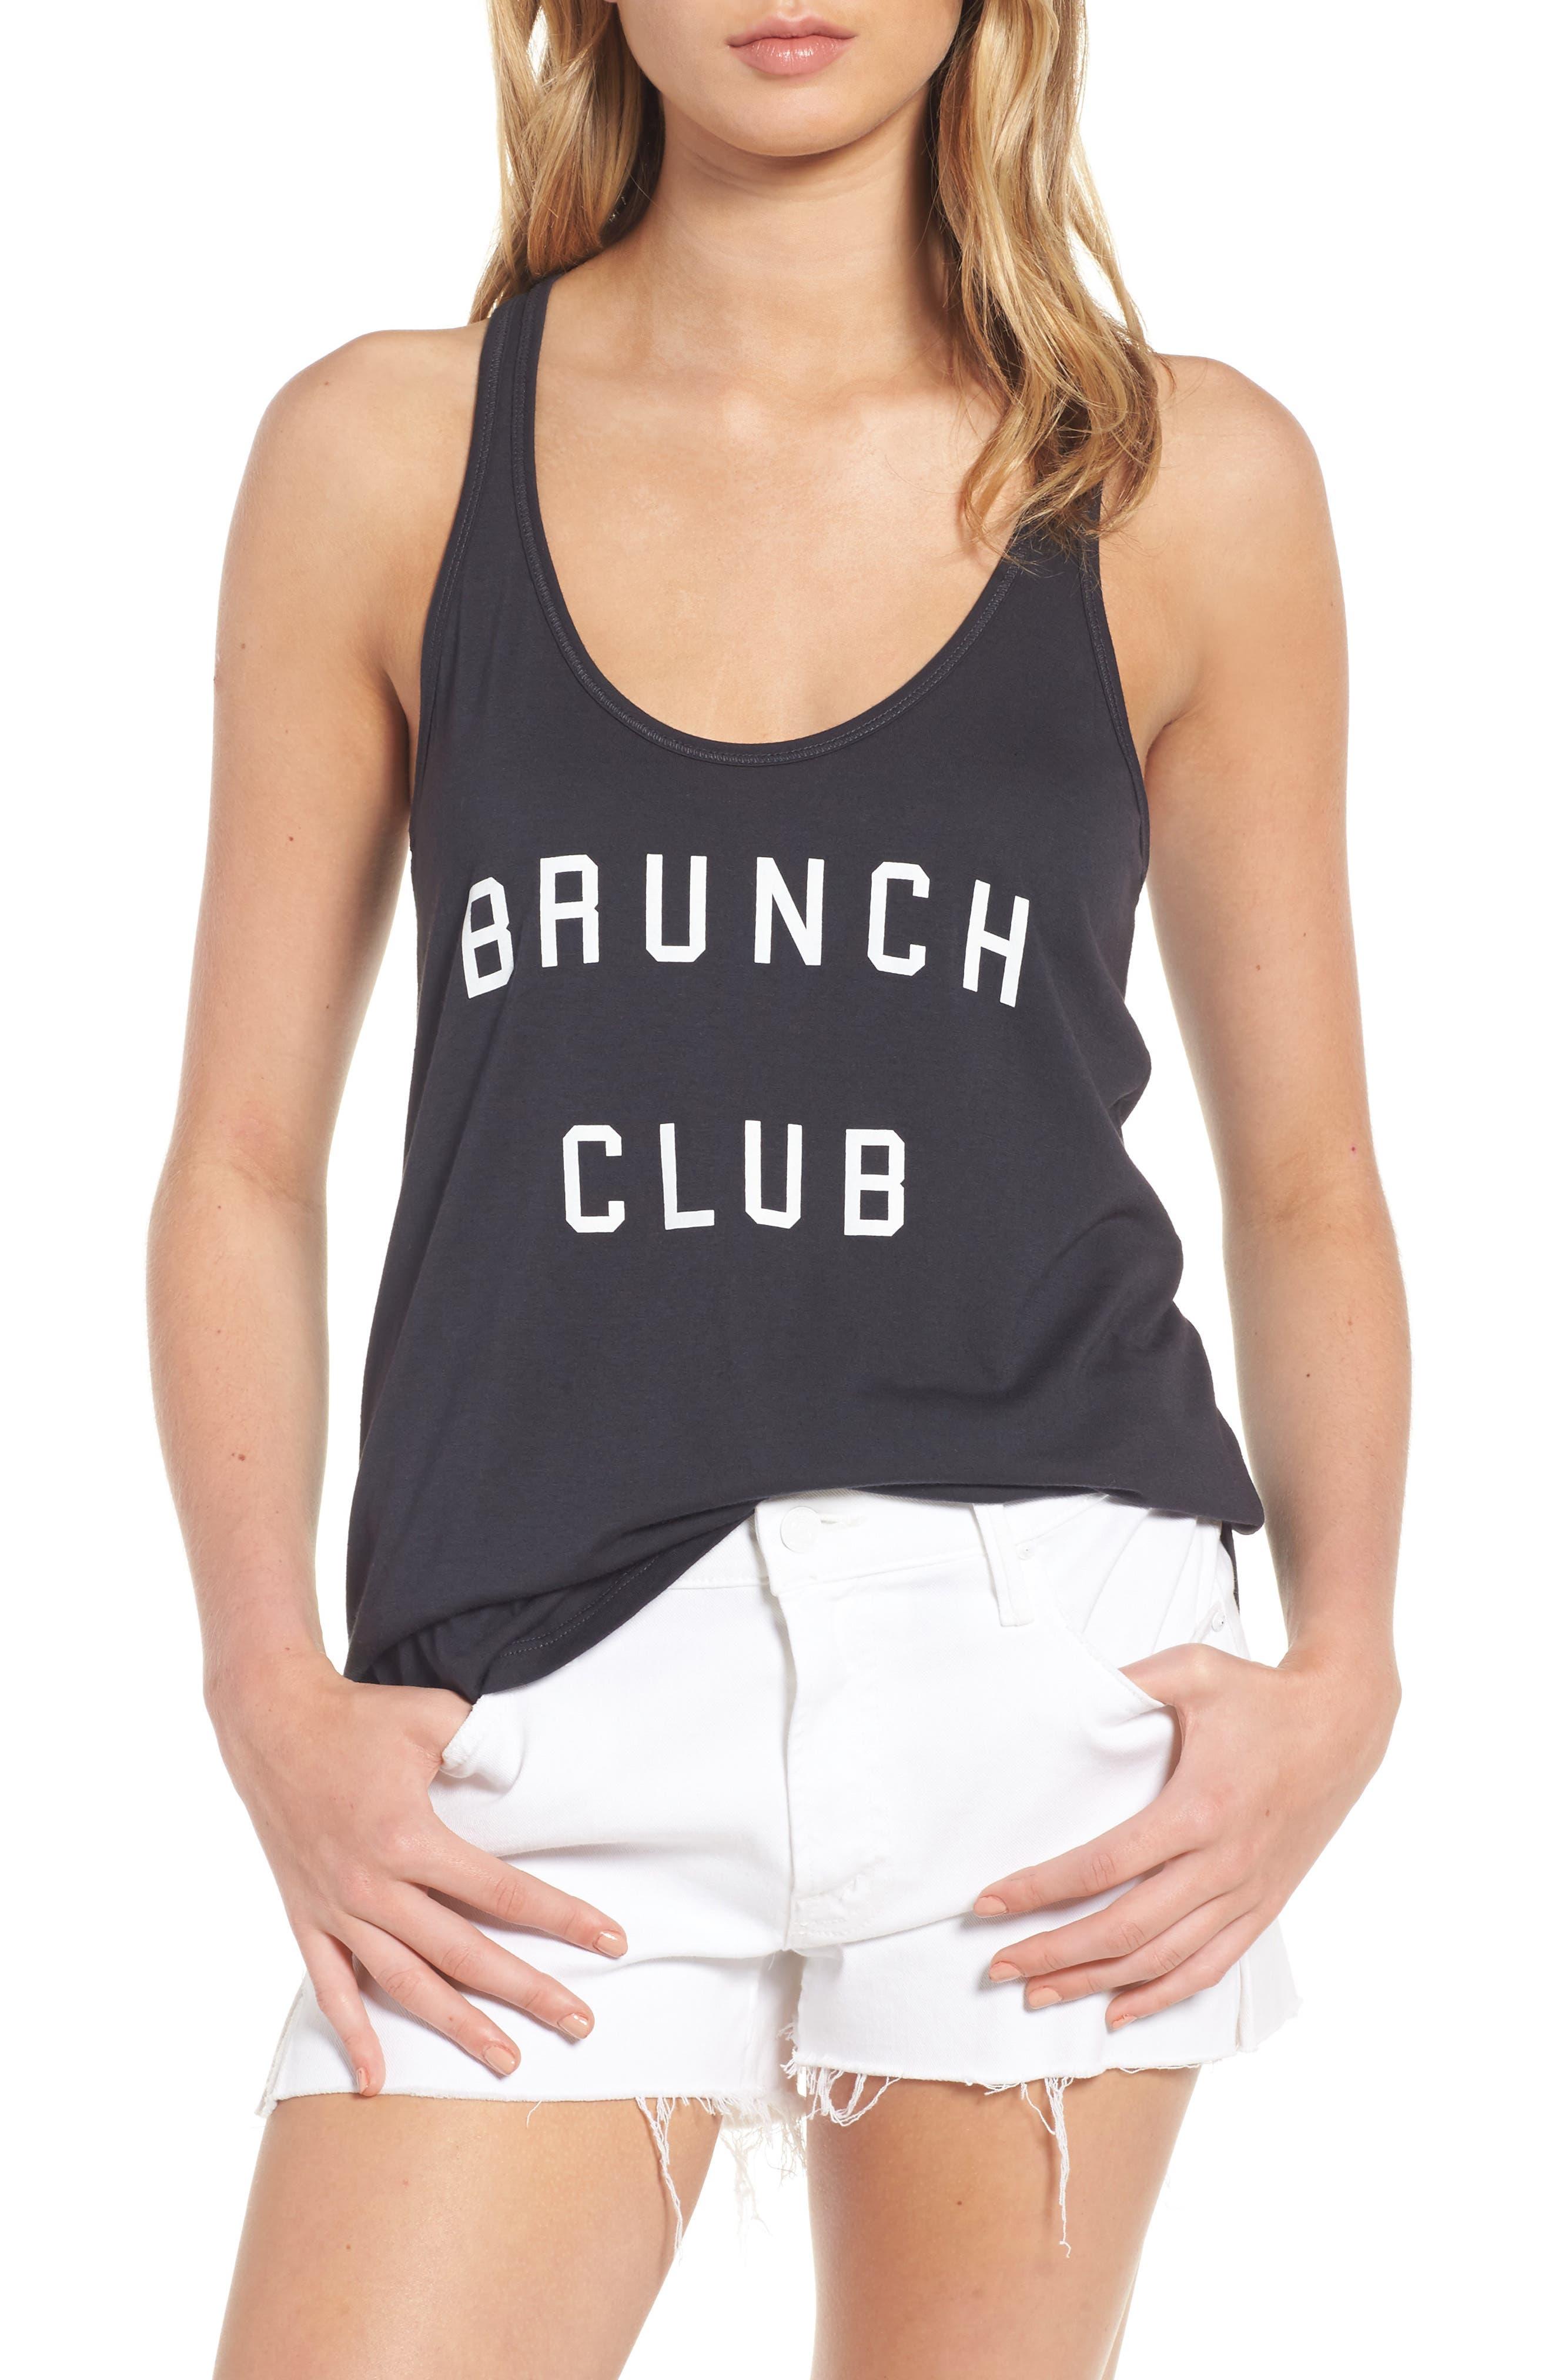 Brunch Club Tank,                         Main,                         color, 001